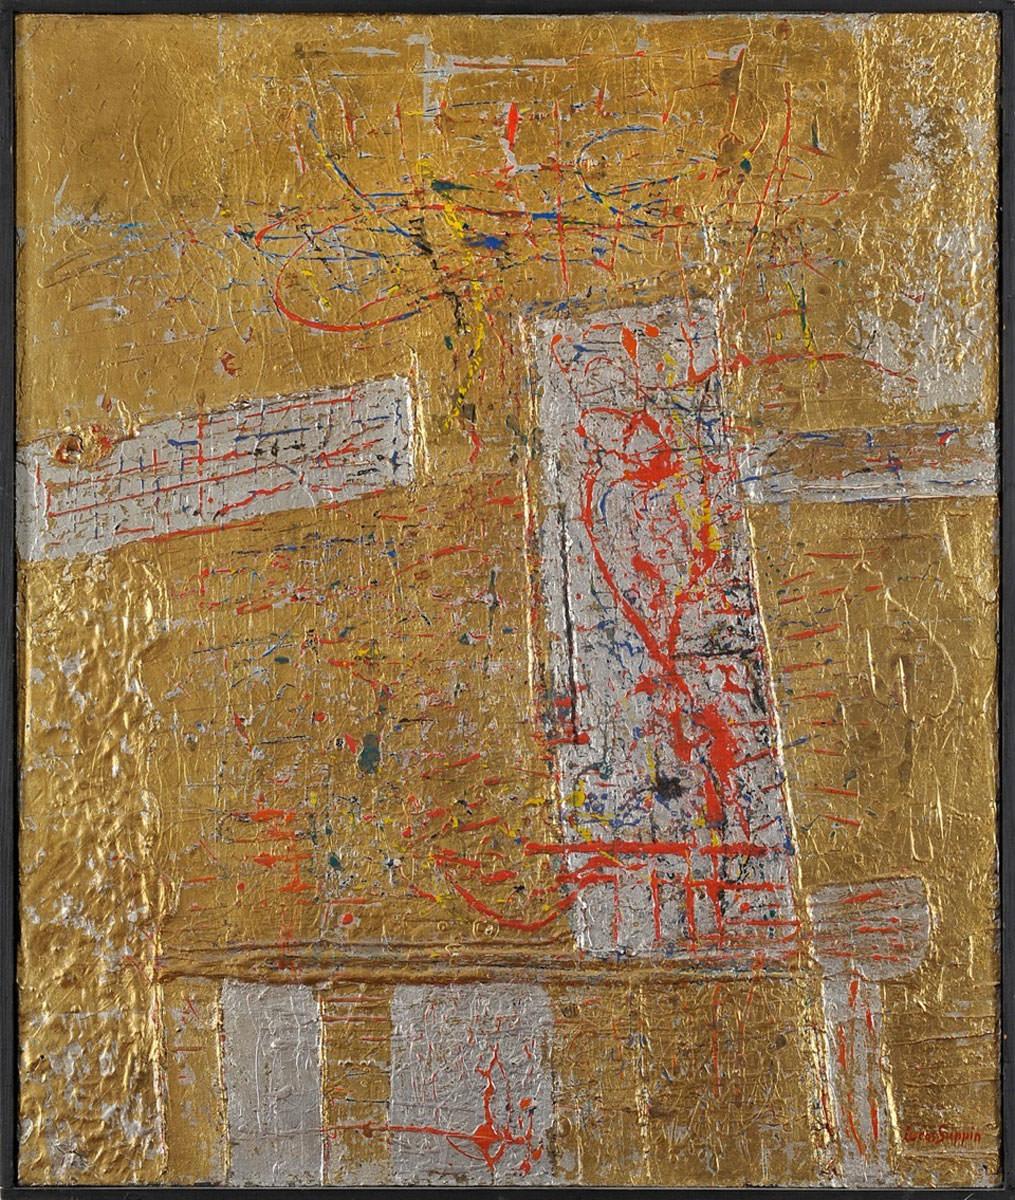 Lucas Suppin. Komposition in Gold. um 1964. Öl / Holz. 86 x 73cm